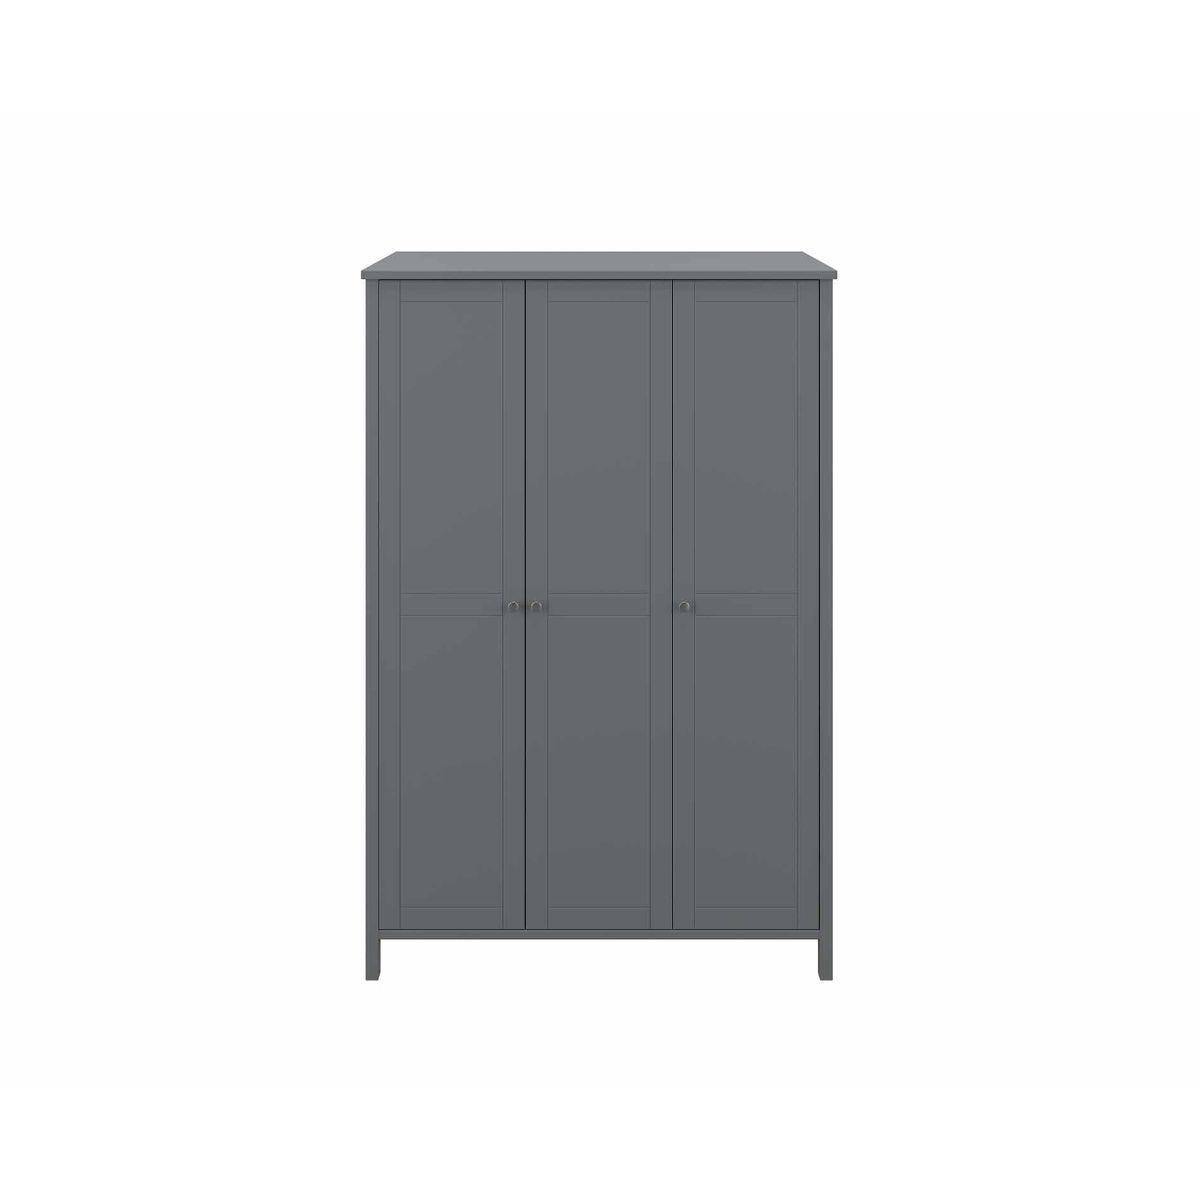 Steens Tromso 3 Door Wardrobe, Grey